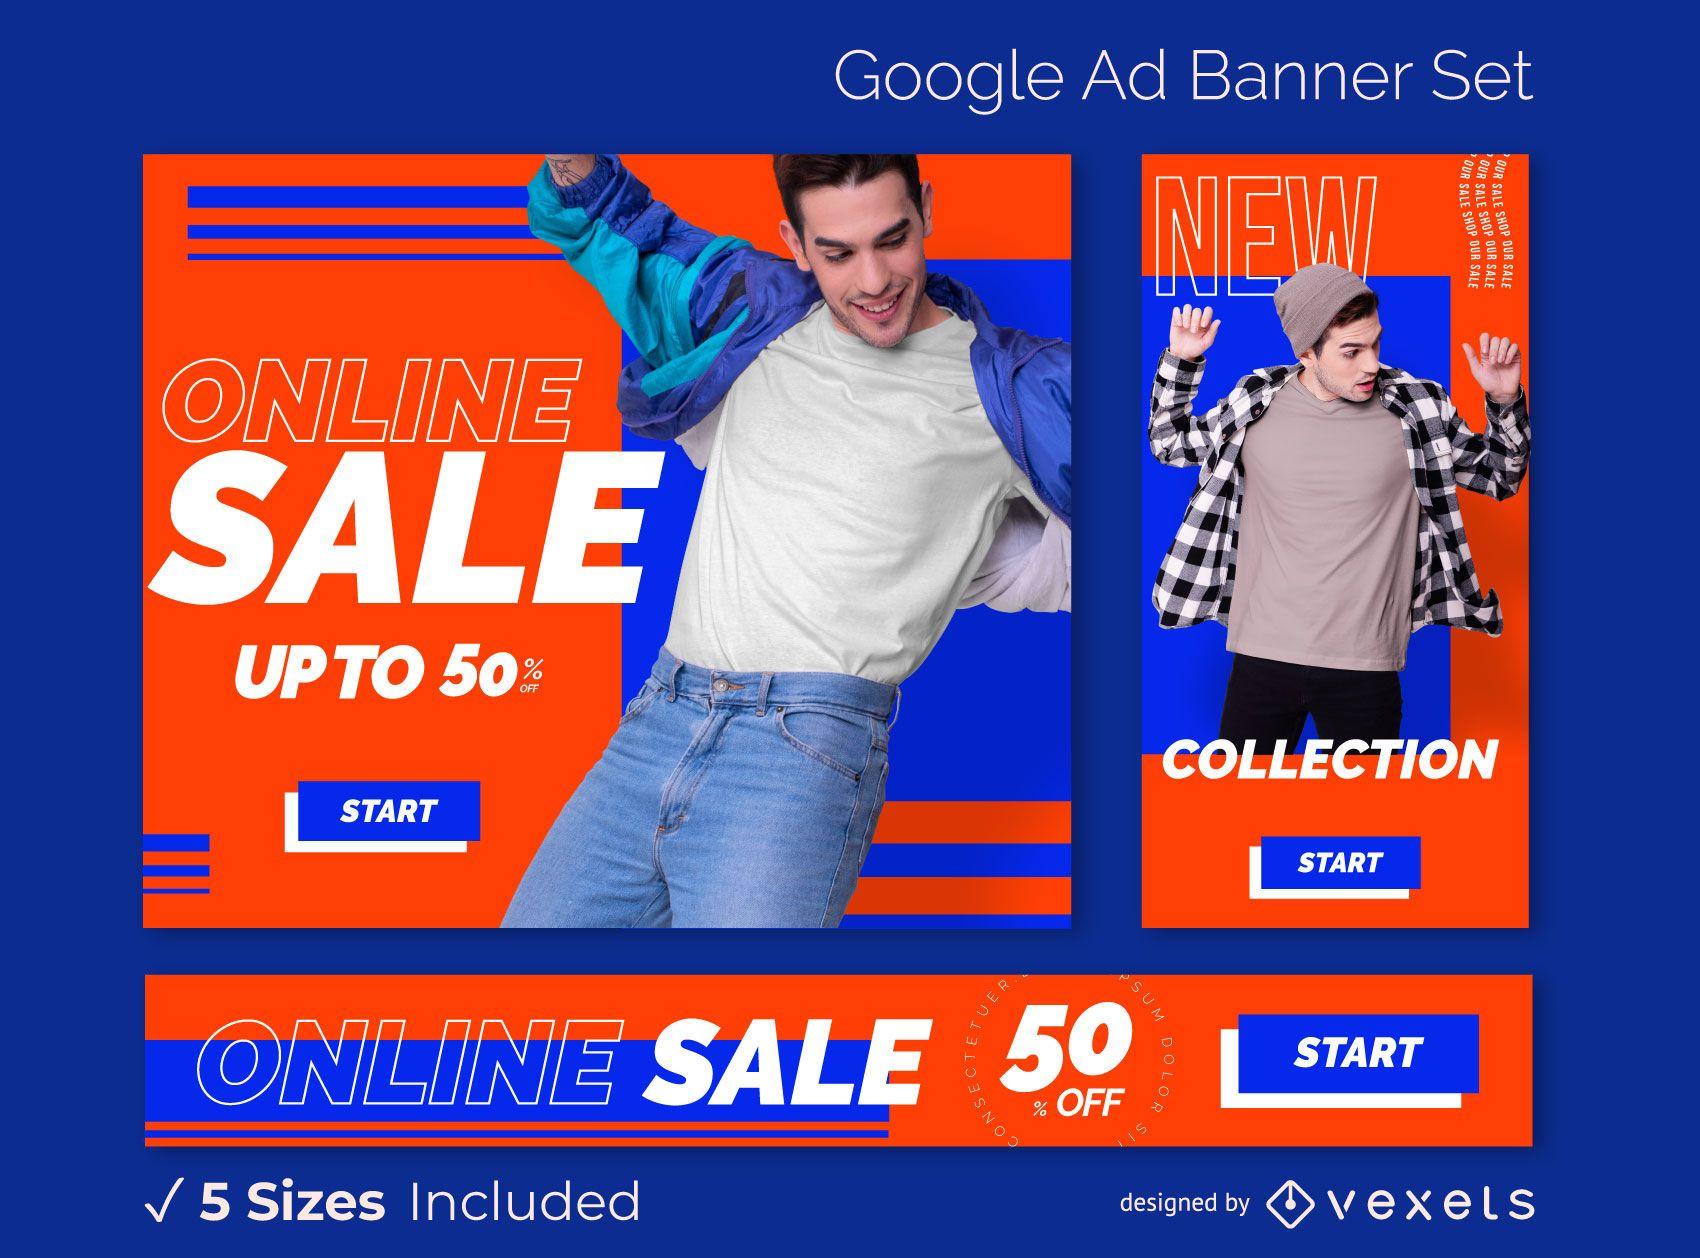 Online store sale ads banner set